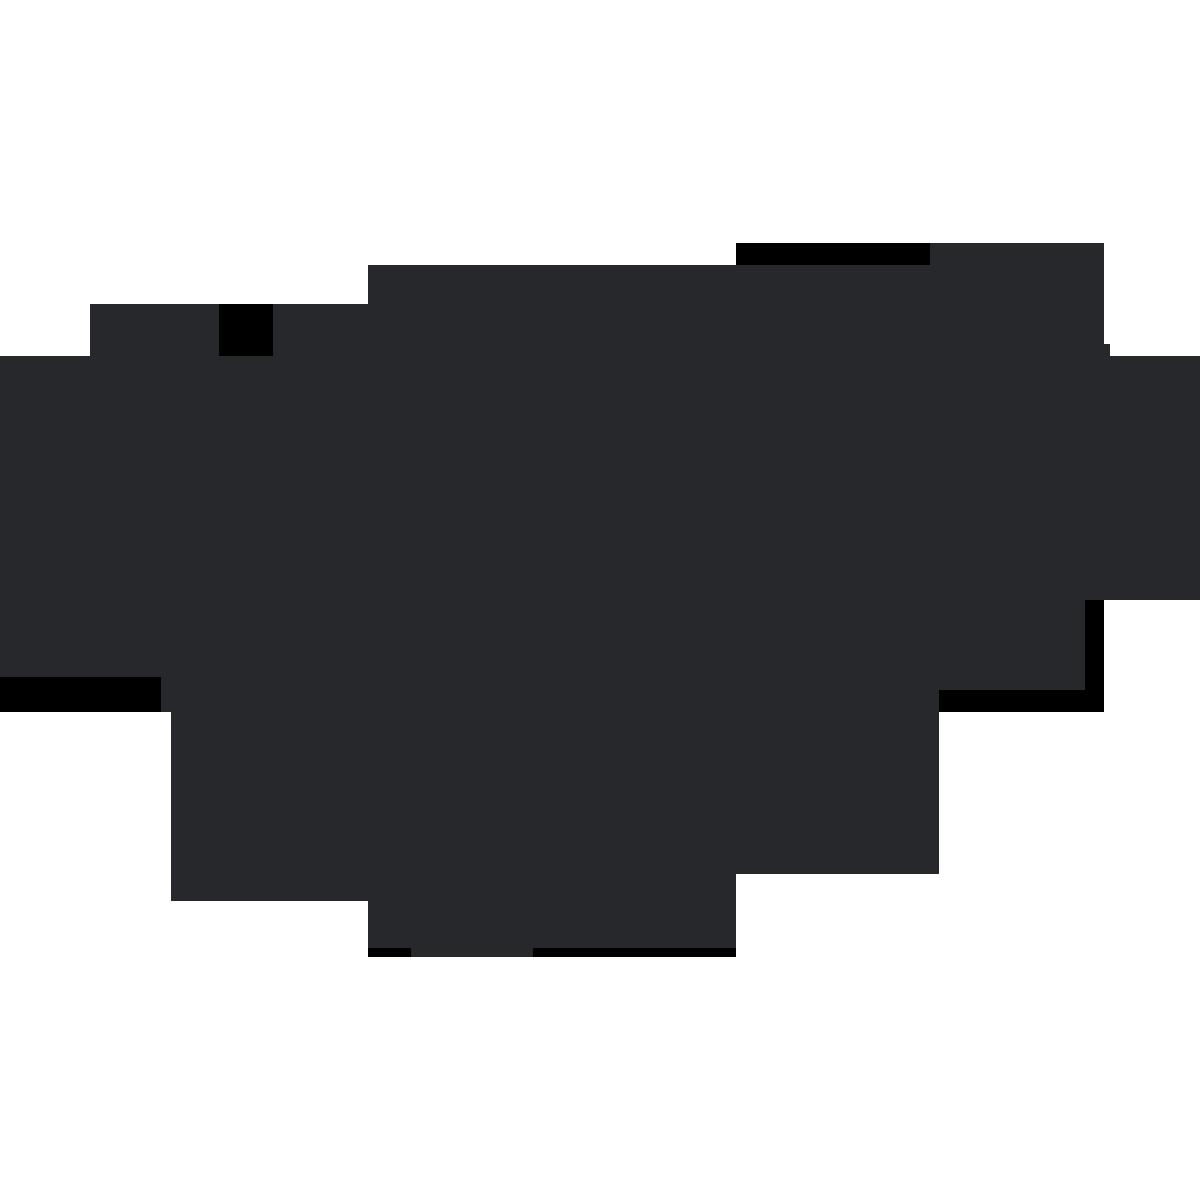 Computer icons clip art. Handshake clipart business customer